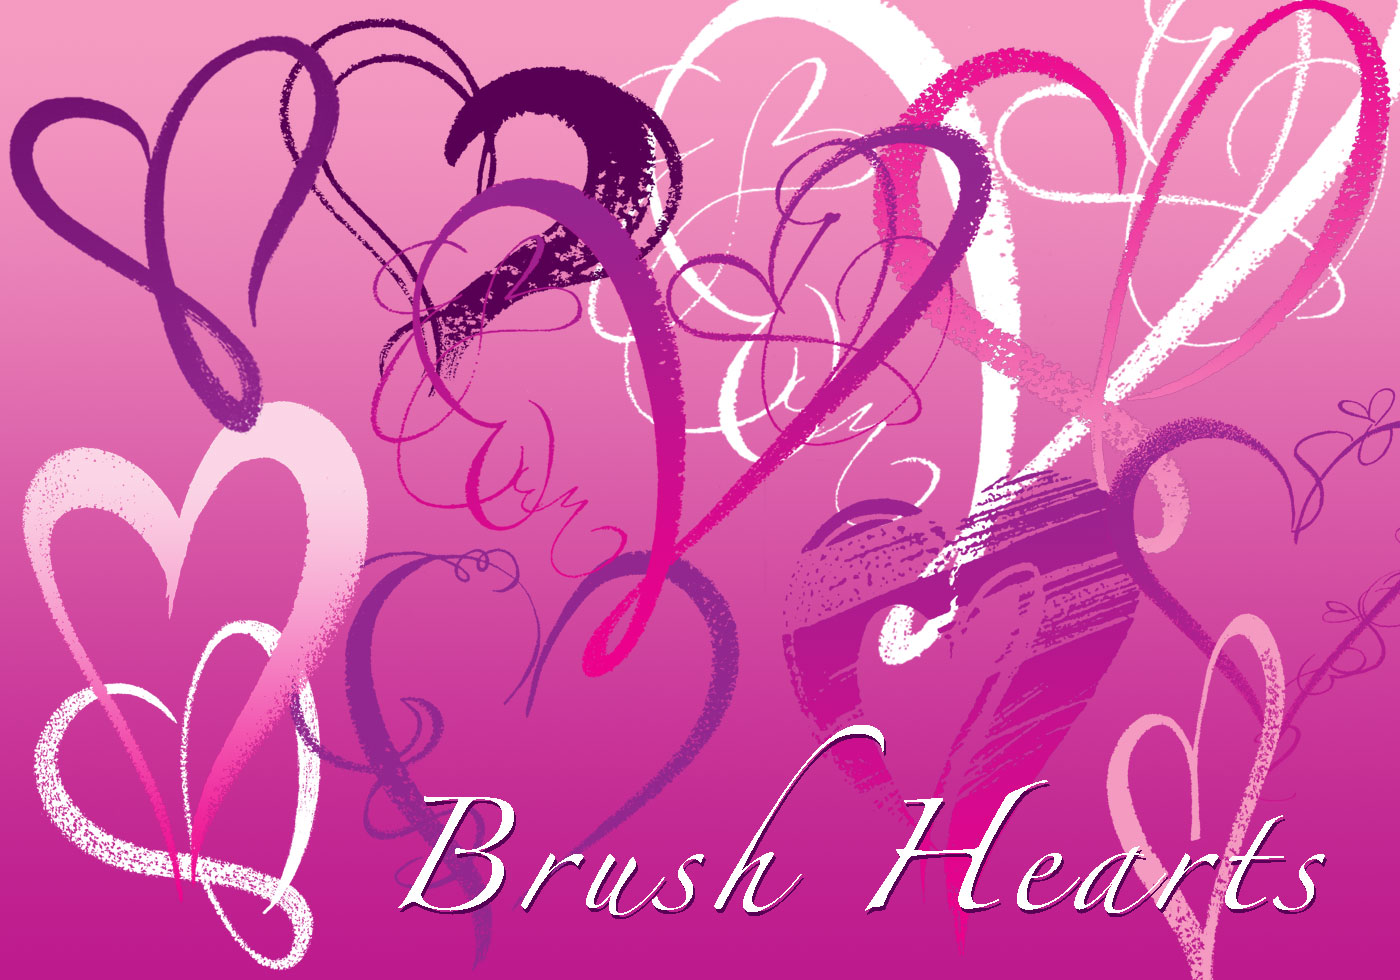 Cute Ribbons Wallpaper Brush Hearts Free Photoshop Brushes At Brusheezy